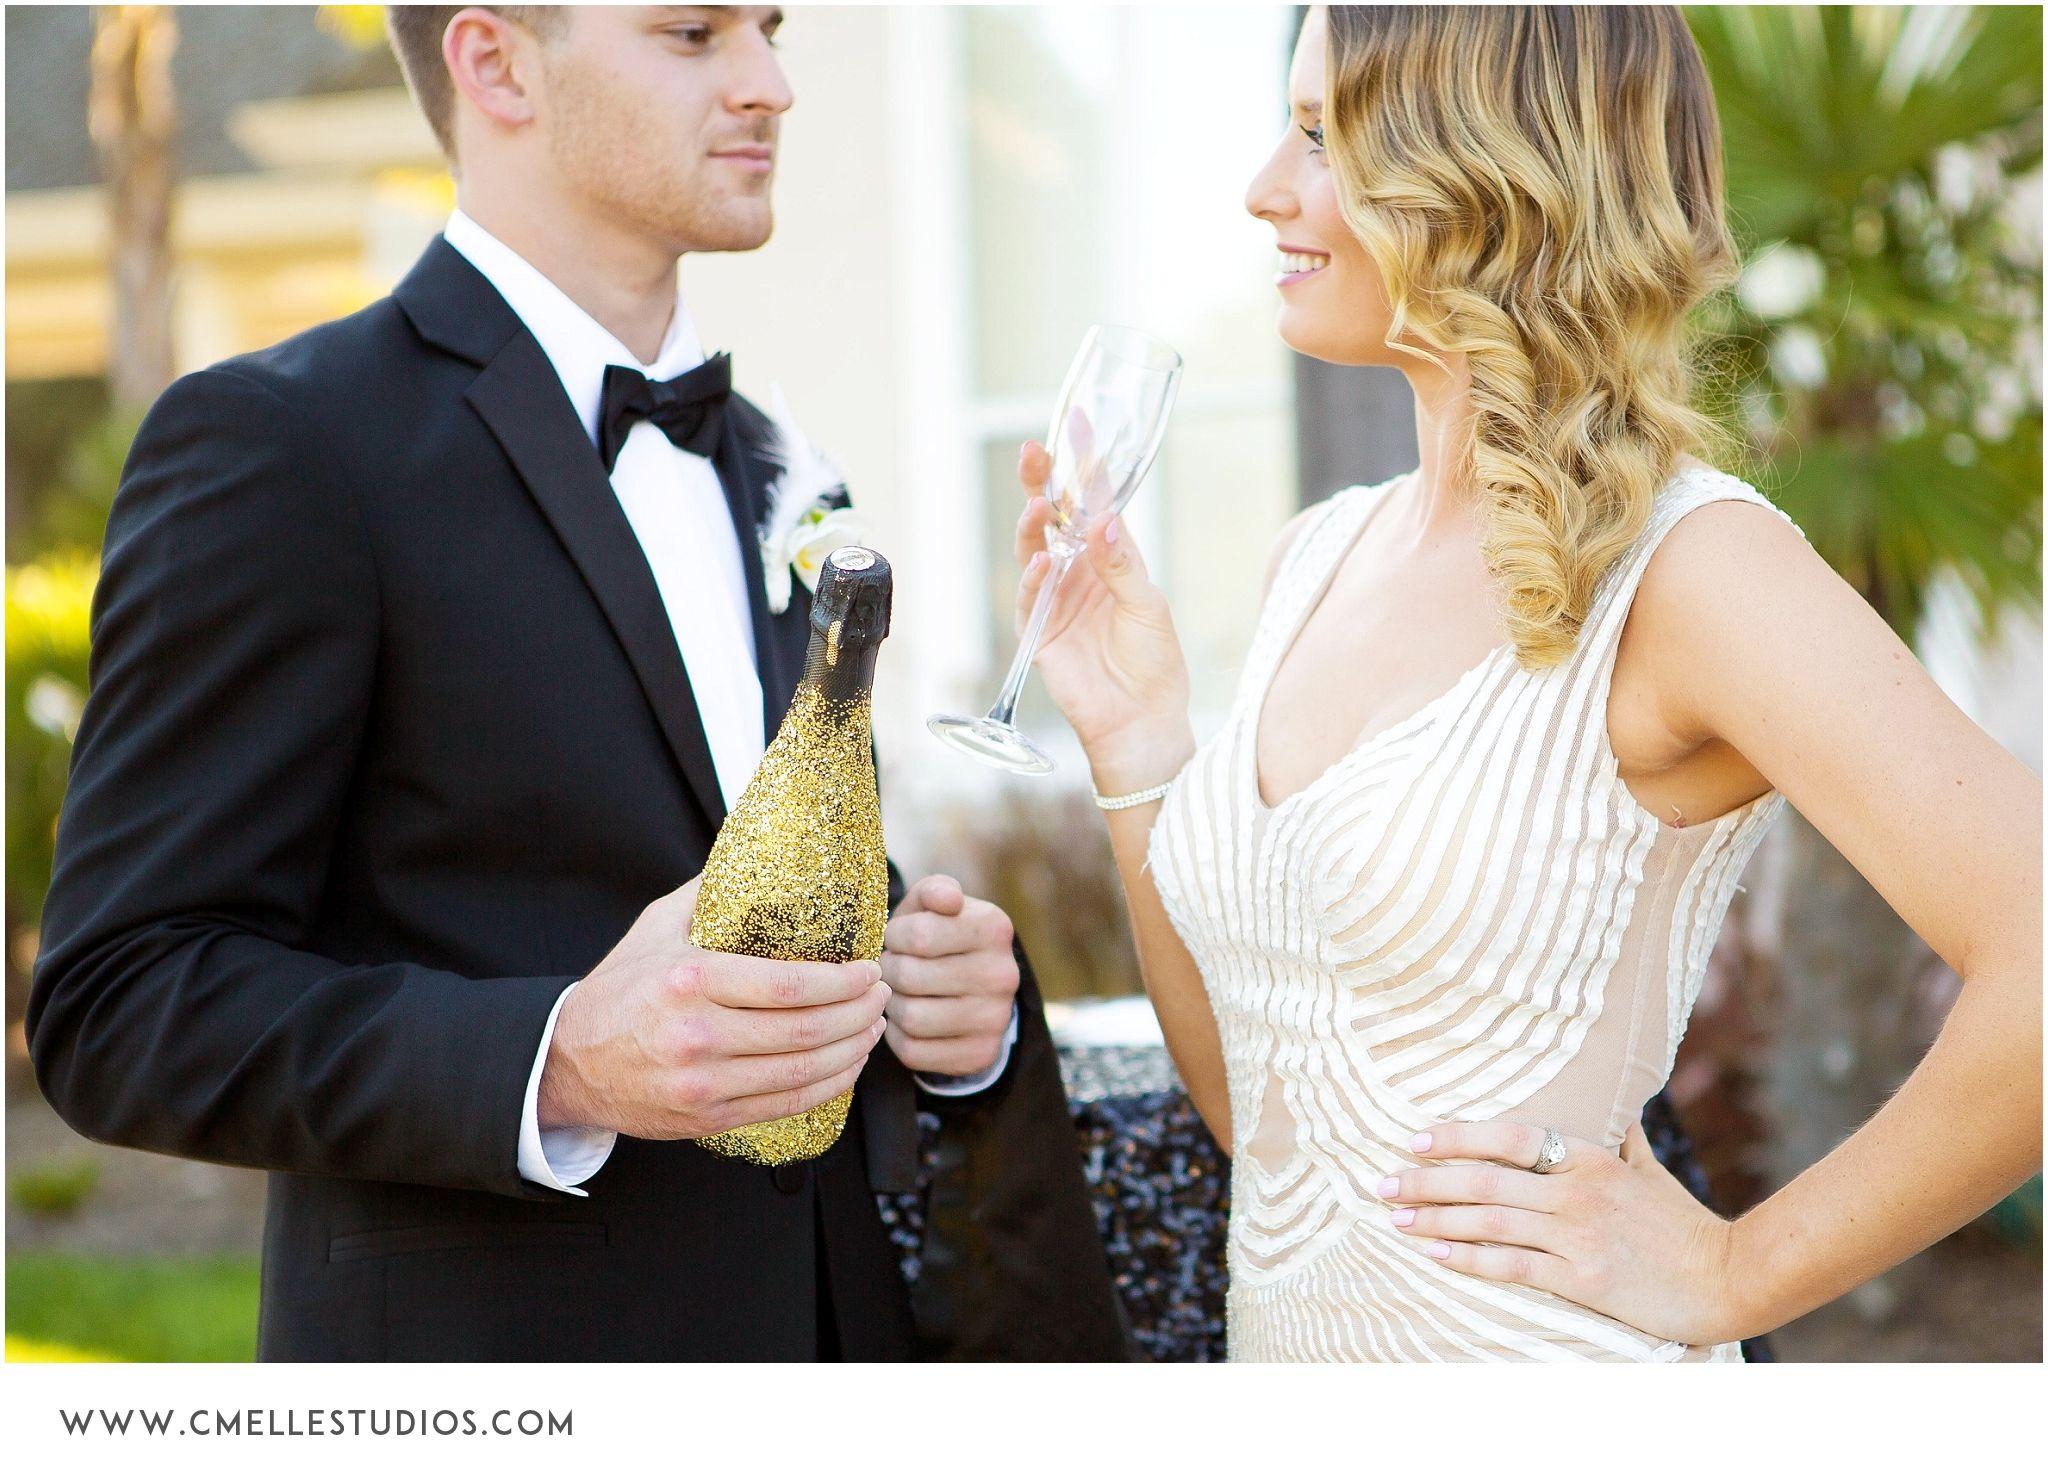 Gatsby Inspired Modern Glam Wedding   Portfolio Shoot   c.m.elle studios   www.ROQUEnapaevents.com